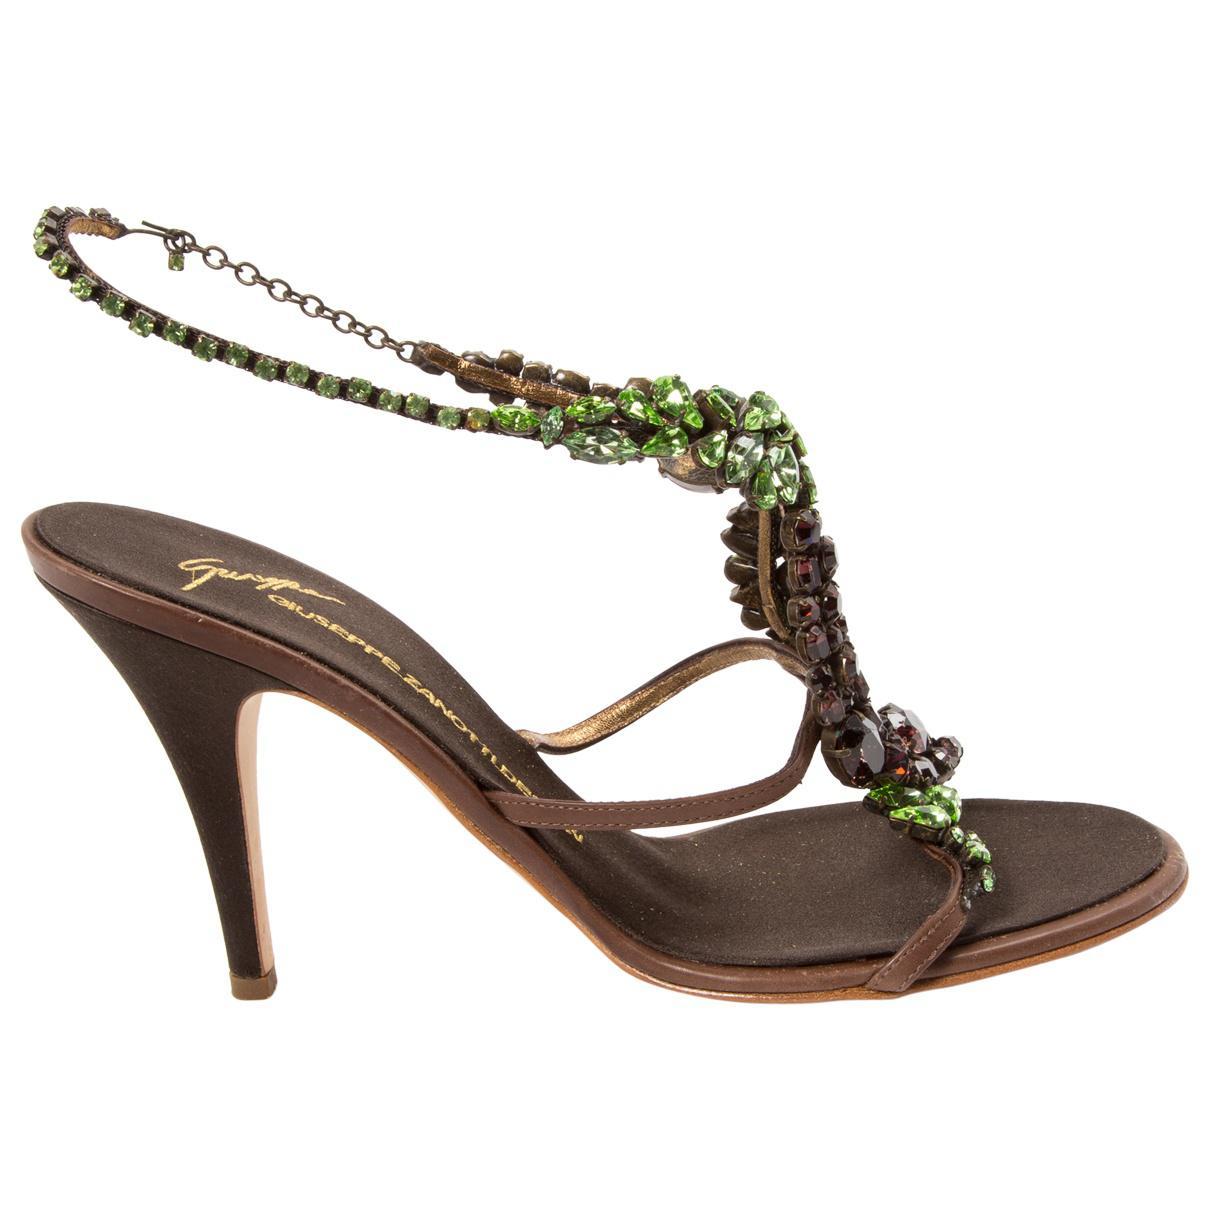 Pre-owned - Cloth sandals Giuseppe Zanotti wjncA2lR61